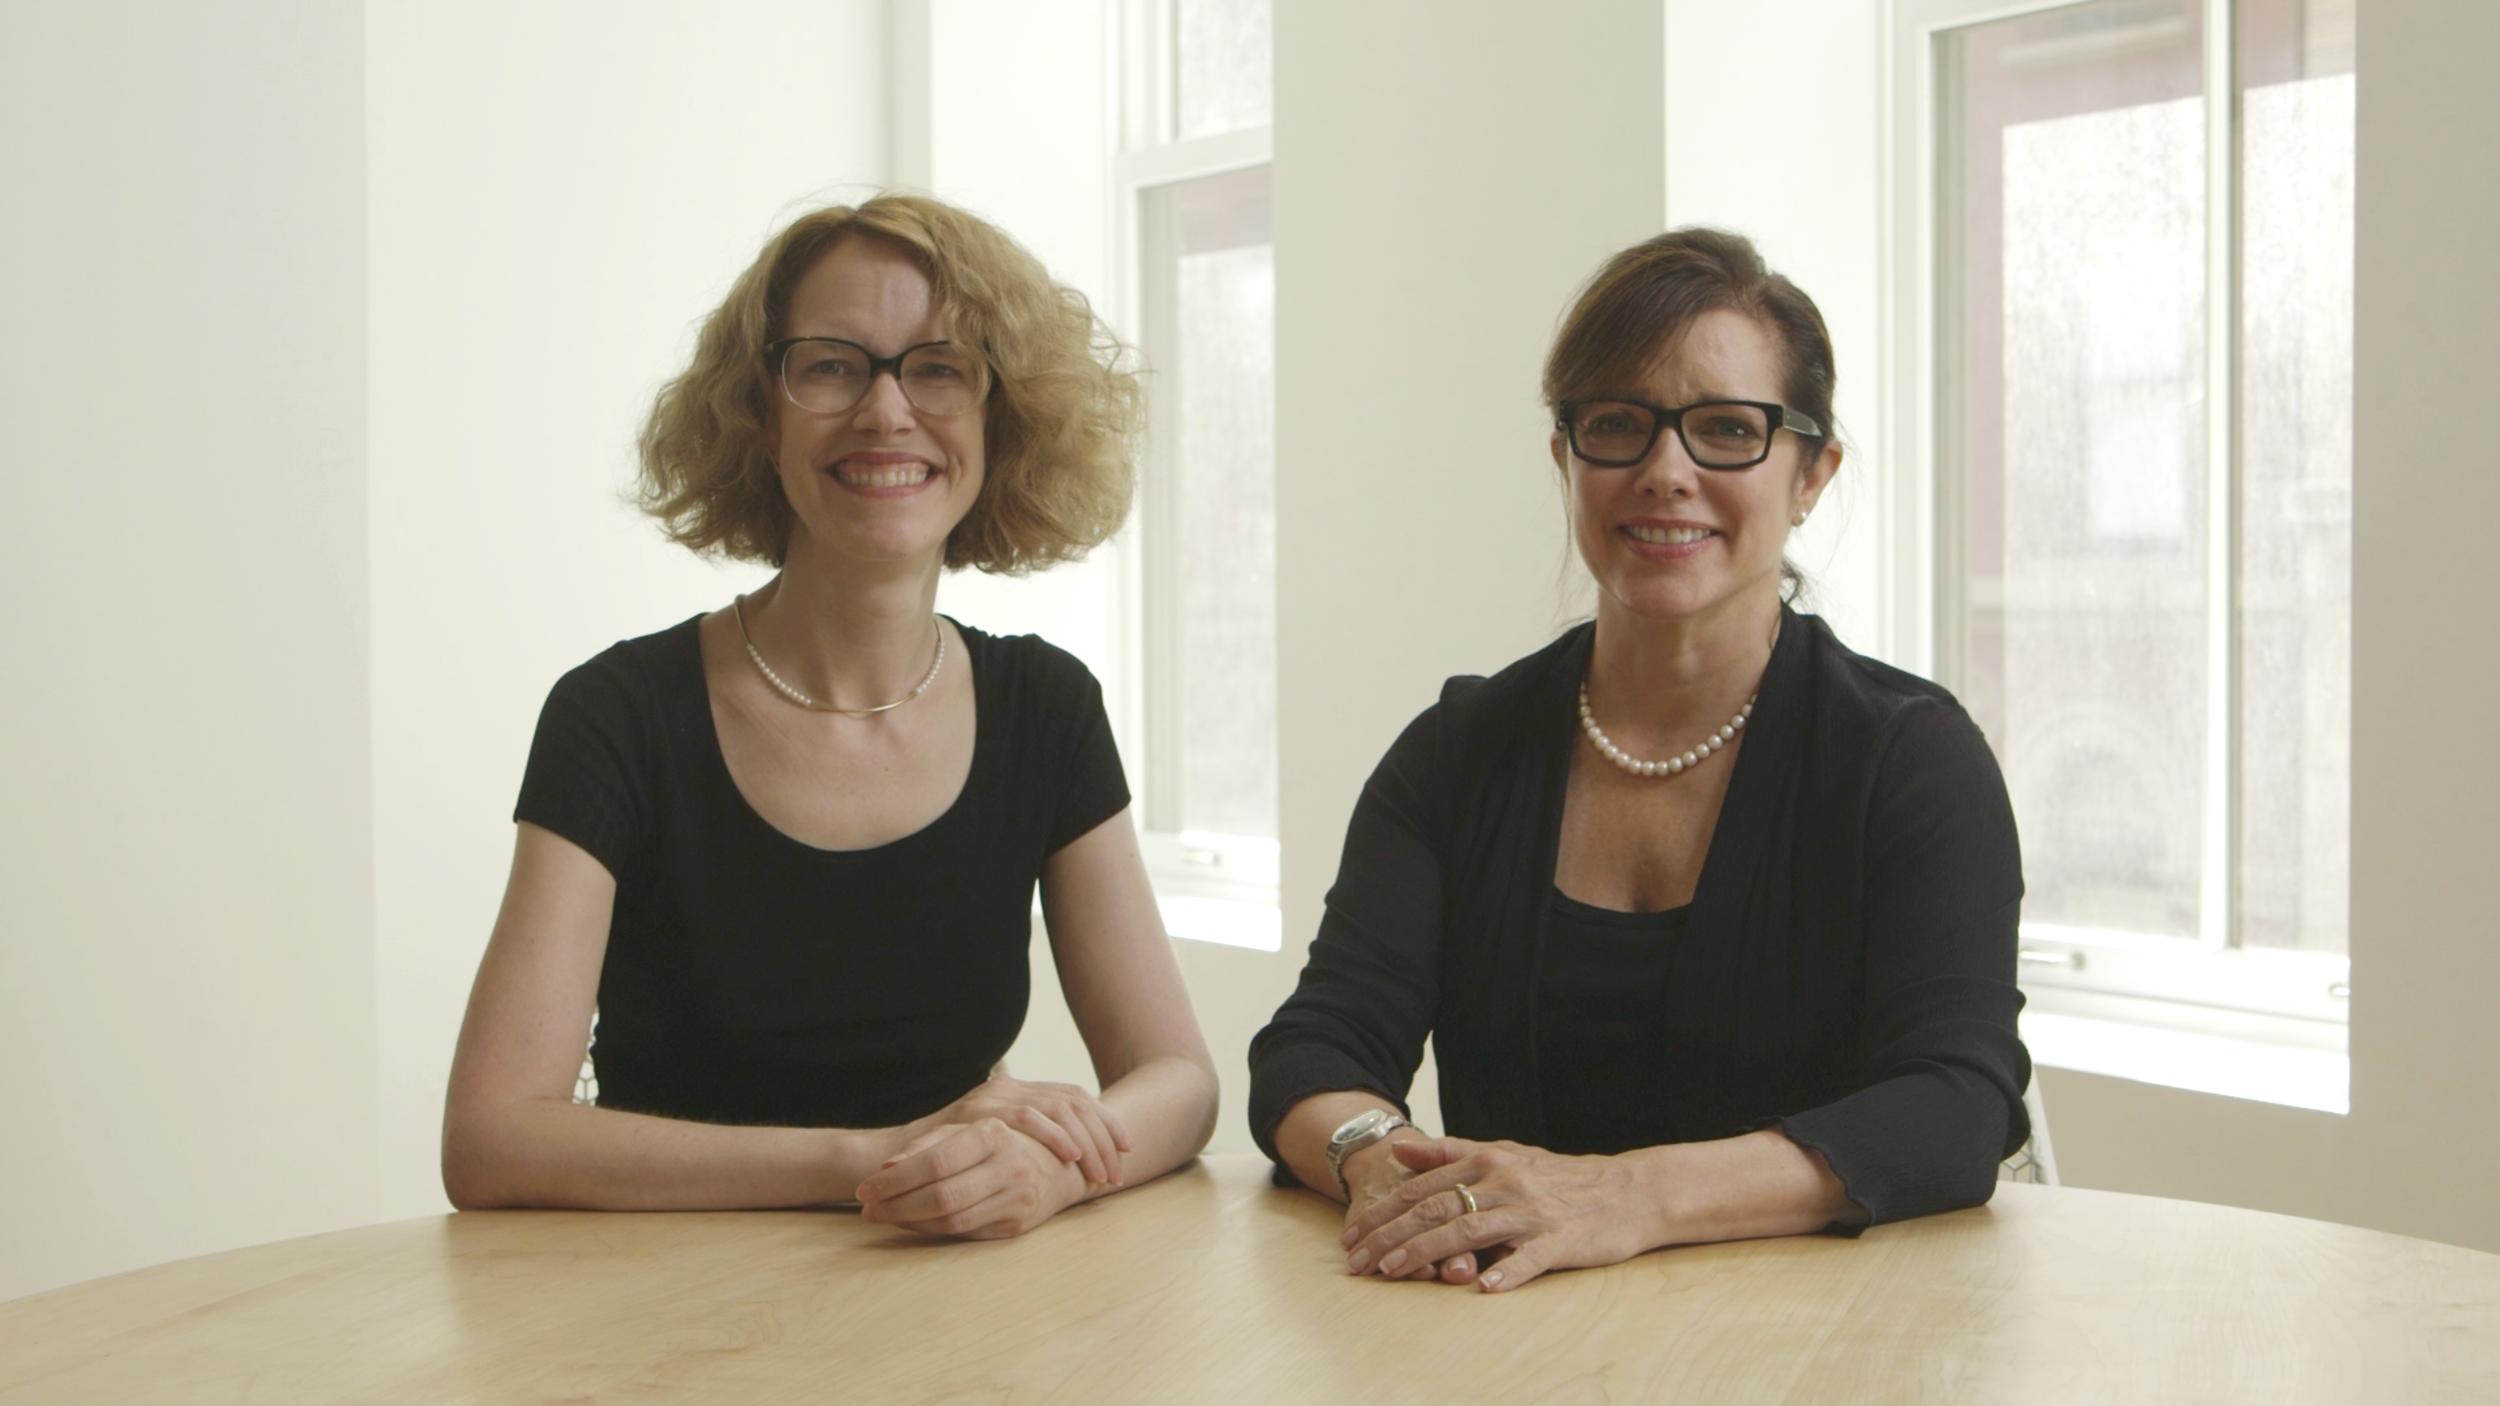 Ellen and Jennifer in their new Skillshare class, Graphic Design Basics: Core Principles for Visual Design .